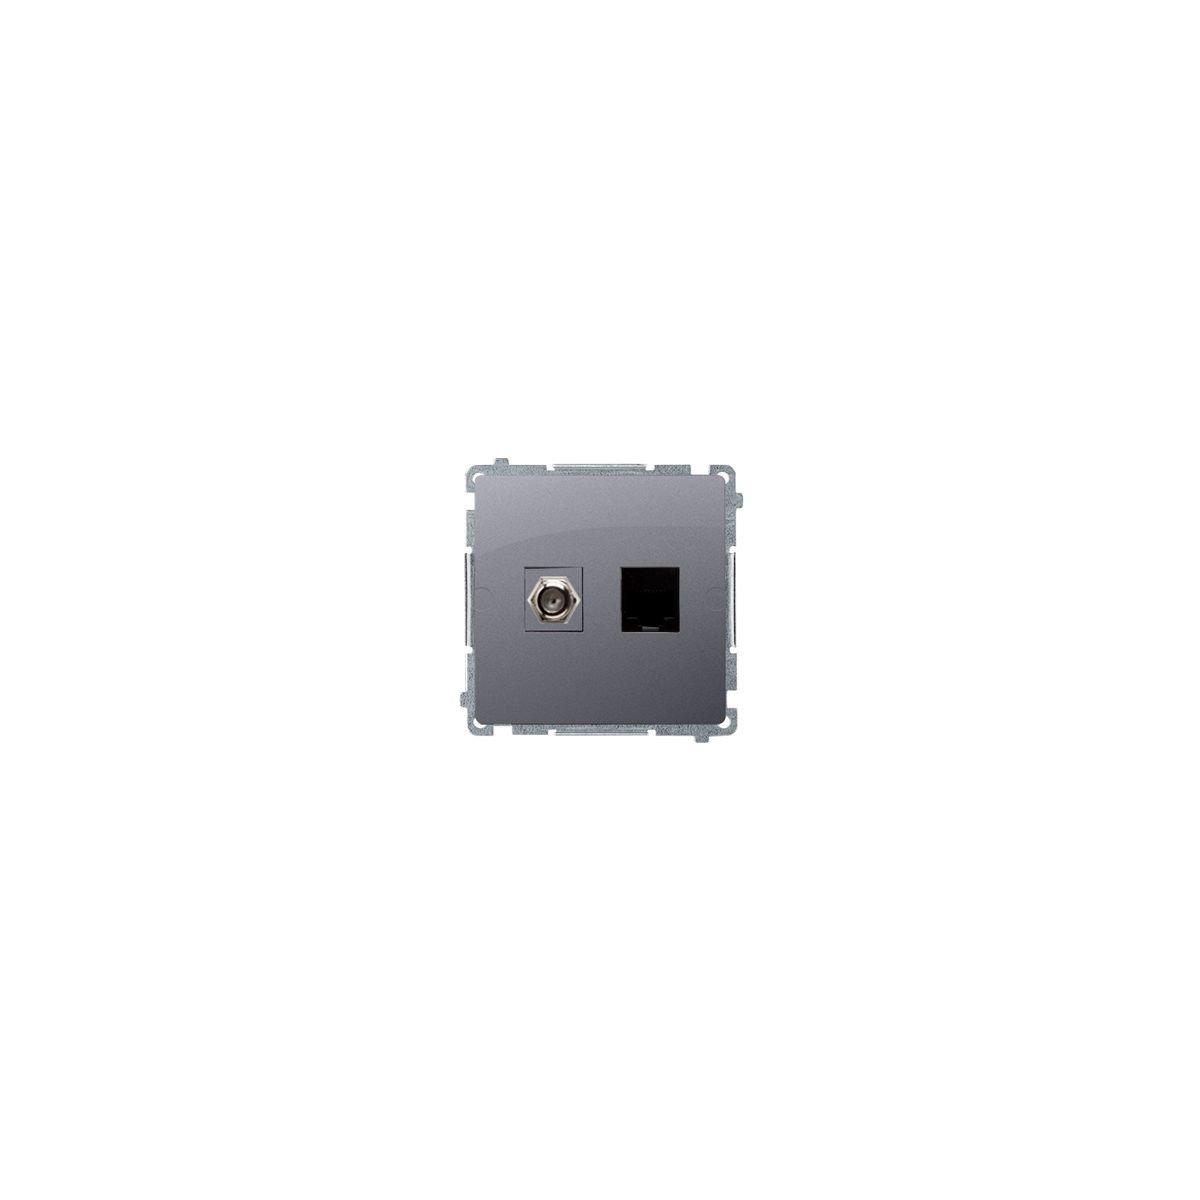 "Gniazdo antenowe typu ""F"" + komputerowe RJ45 kat.6 srebrny mat, metalizowany"